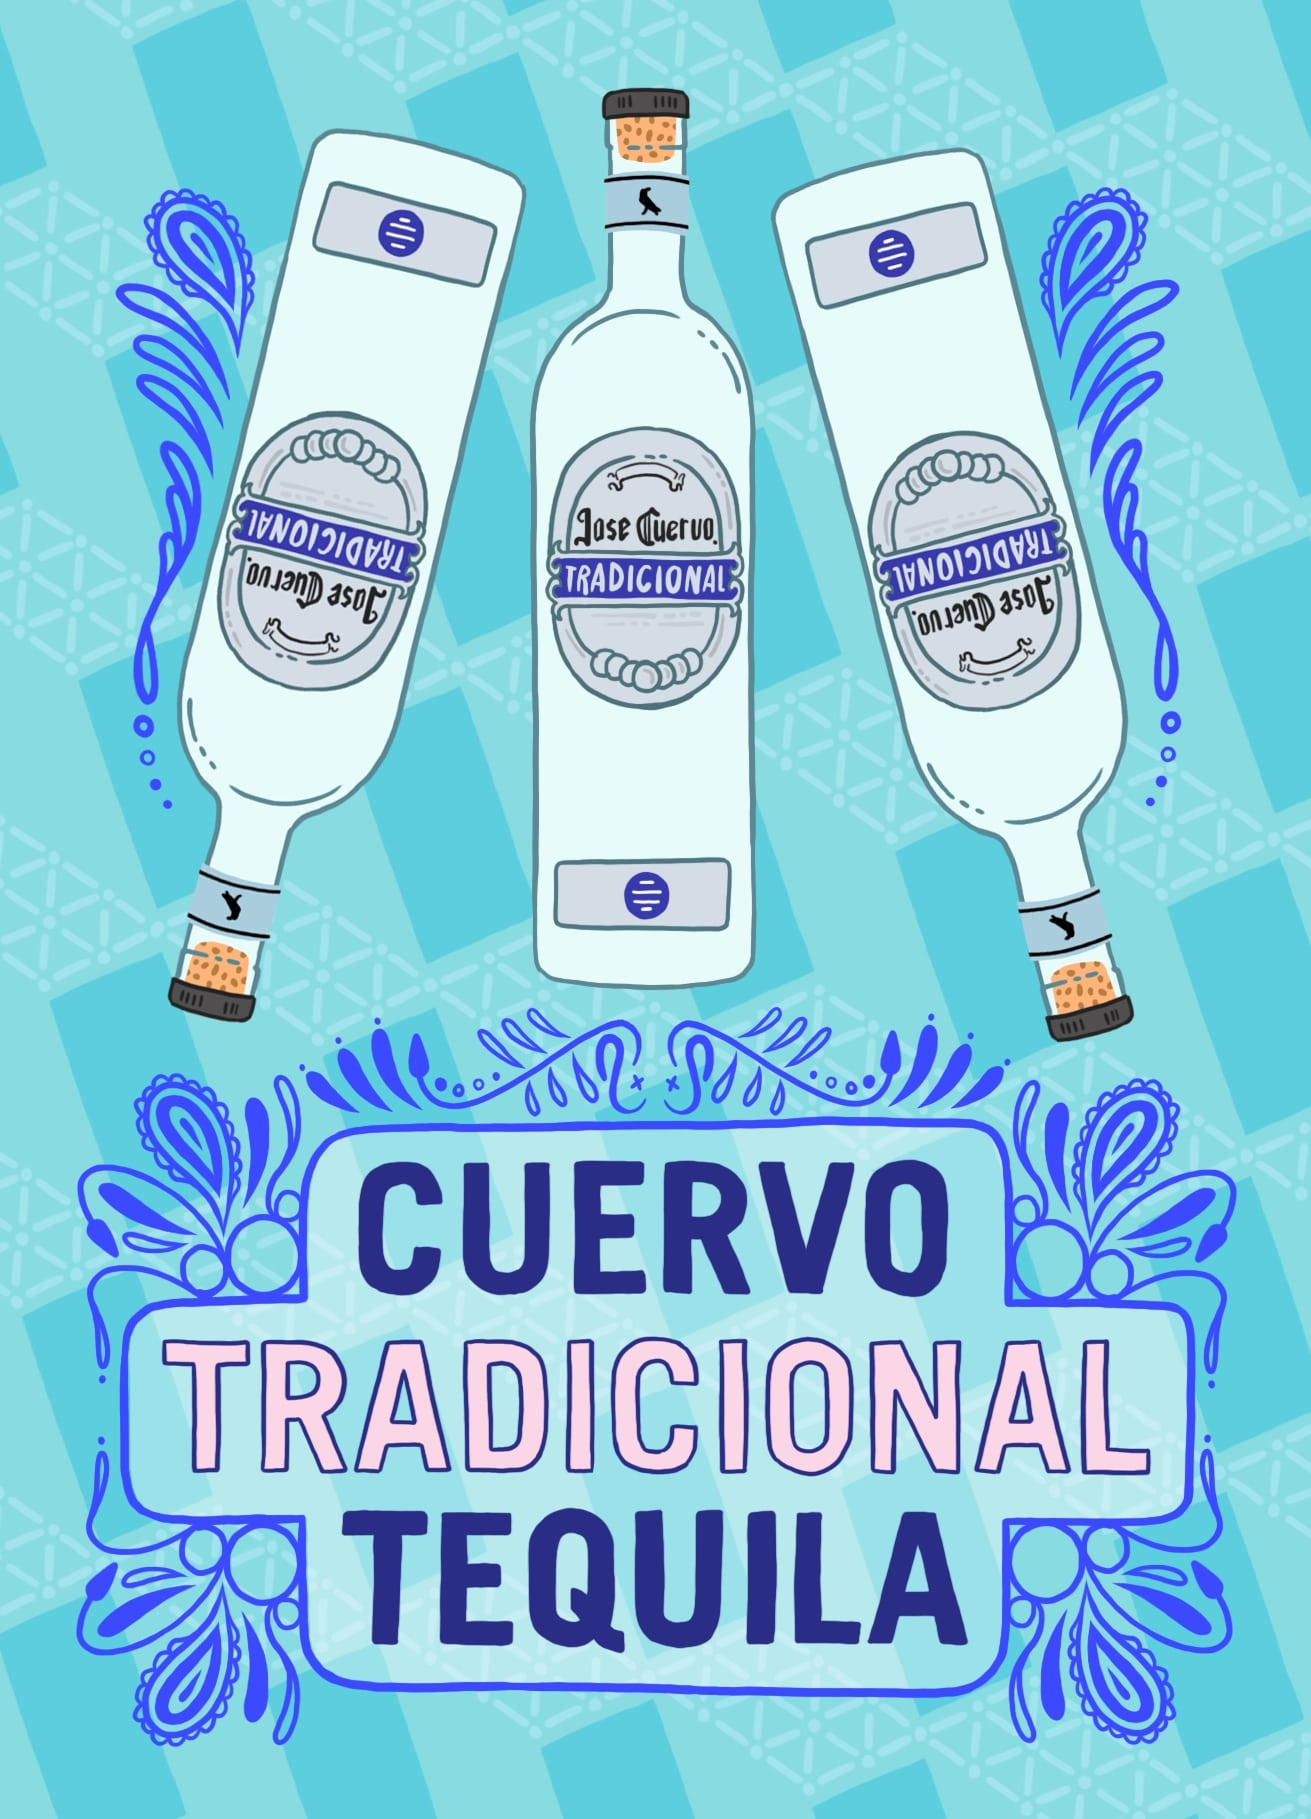 Cuervo Traditional Tequillq_3mmBleed.jpg